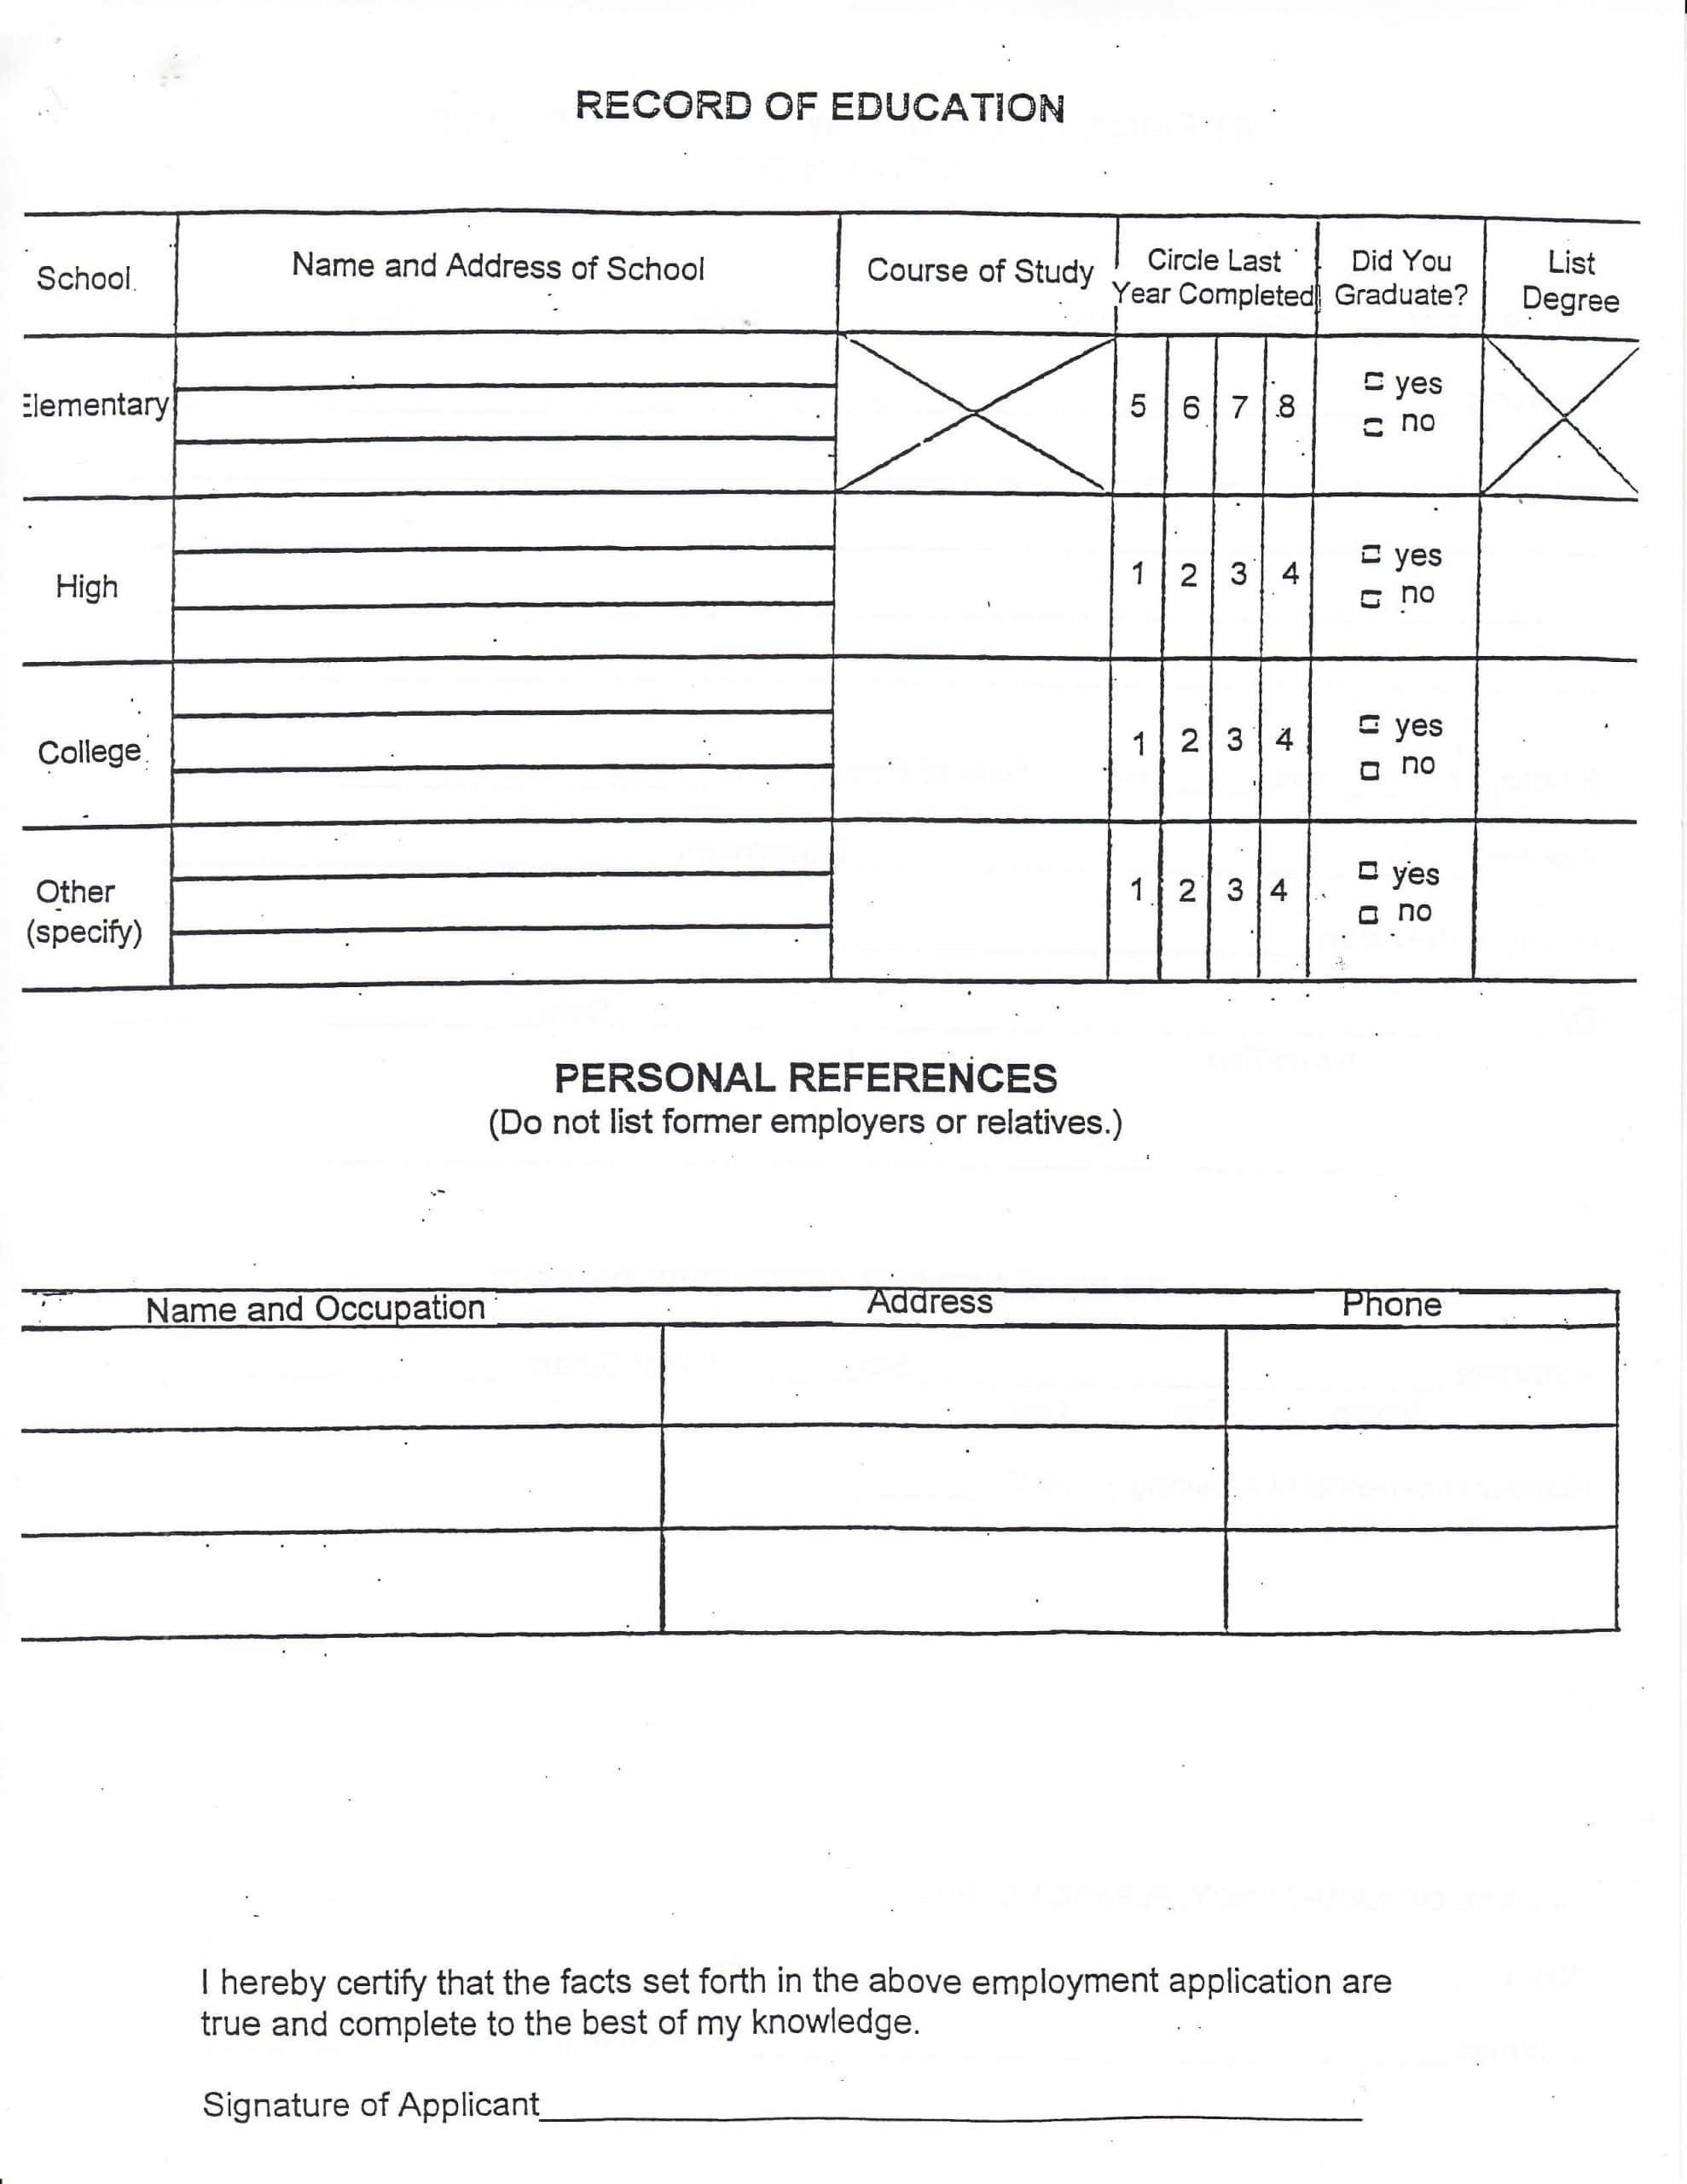 MCPL Application pg. 3